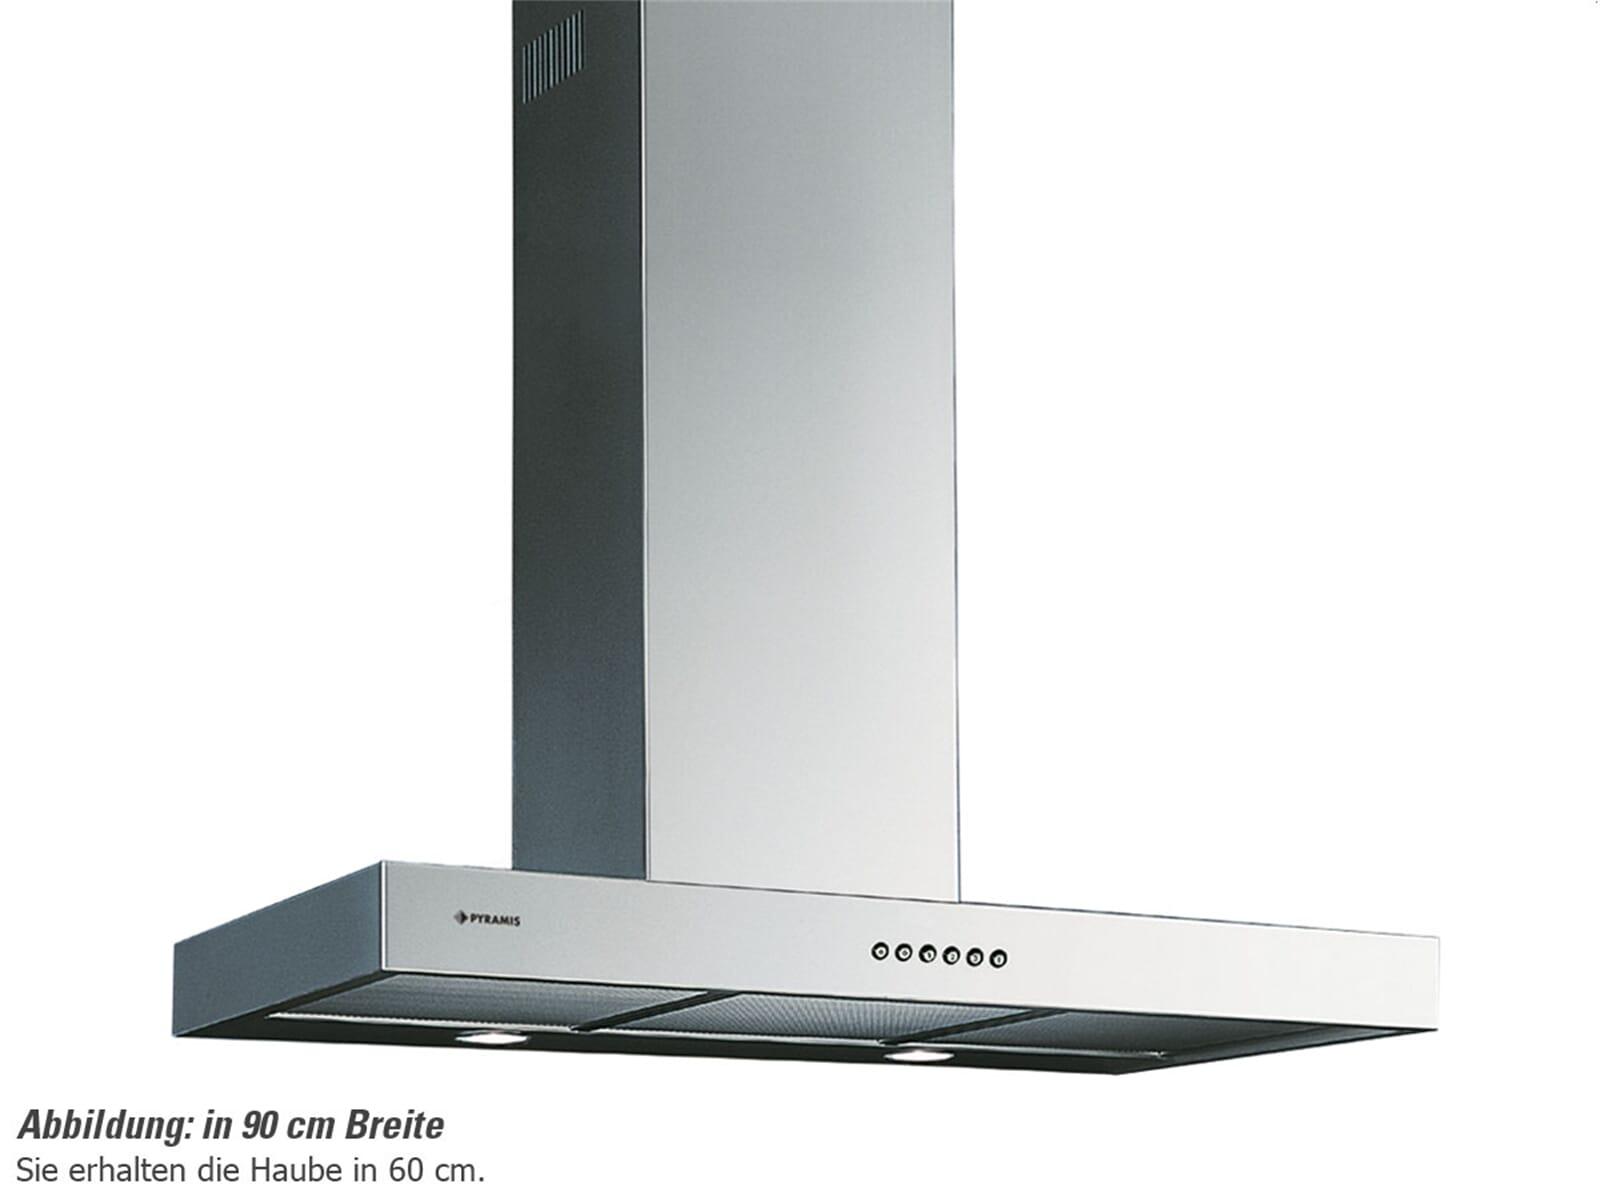 pyramis agilo 60 wand dunstabzugshaube edelstahl f r 298 90 eur. Black Bedroom Furniture Sets. Home Design Ideas